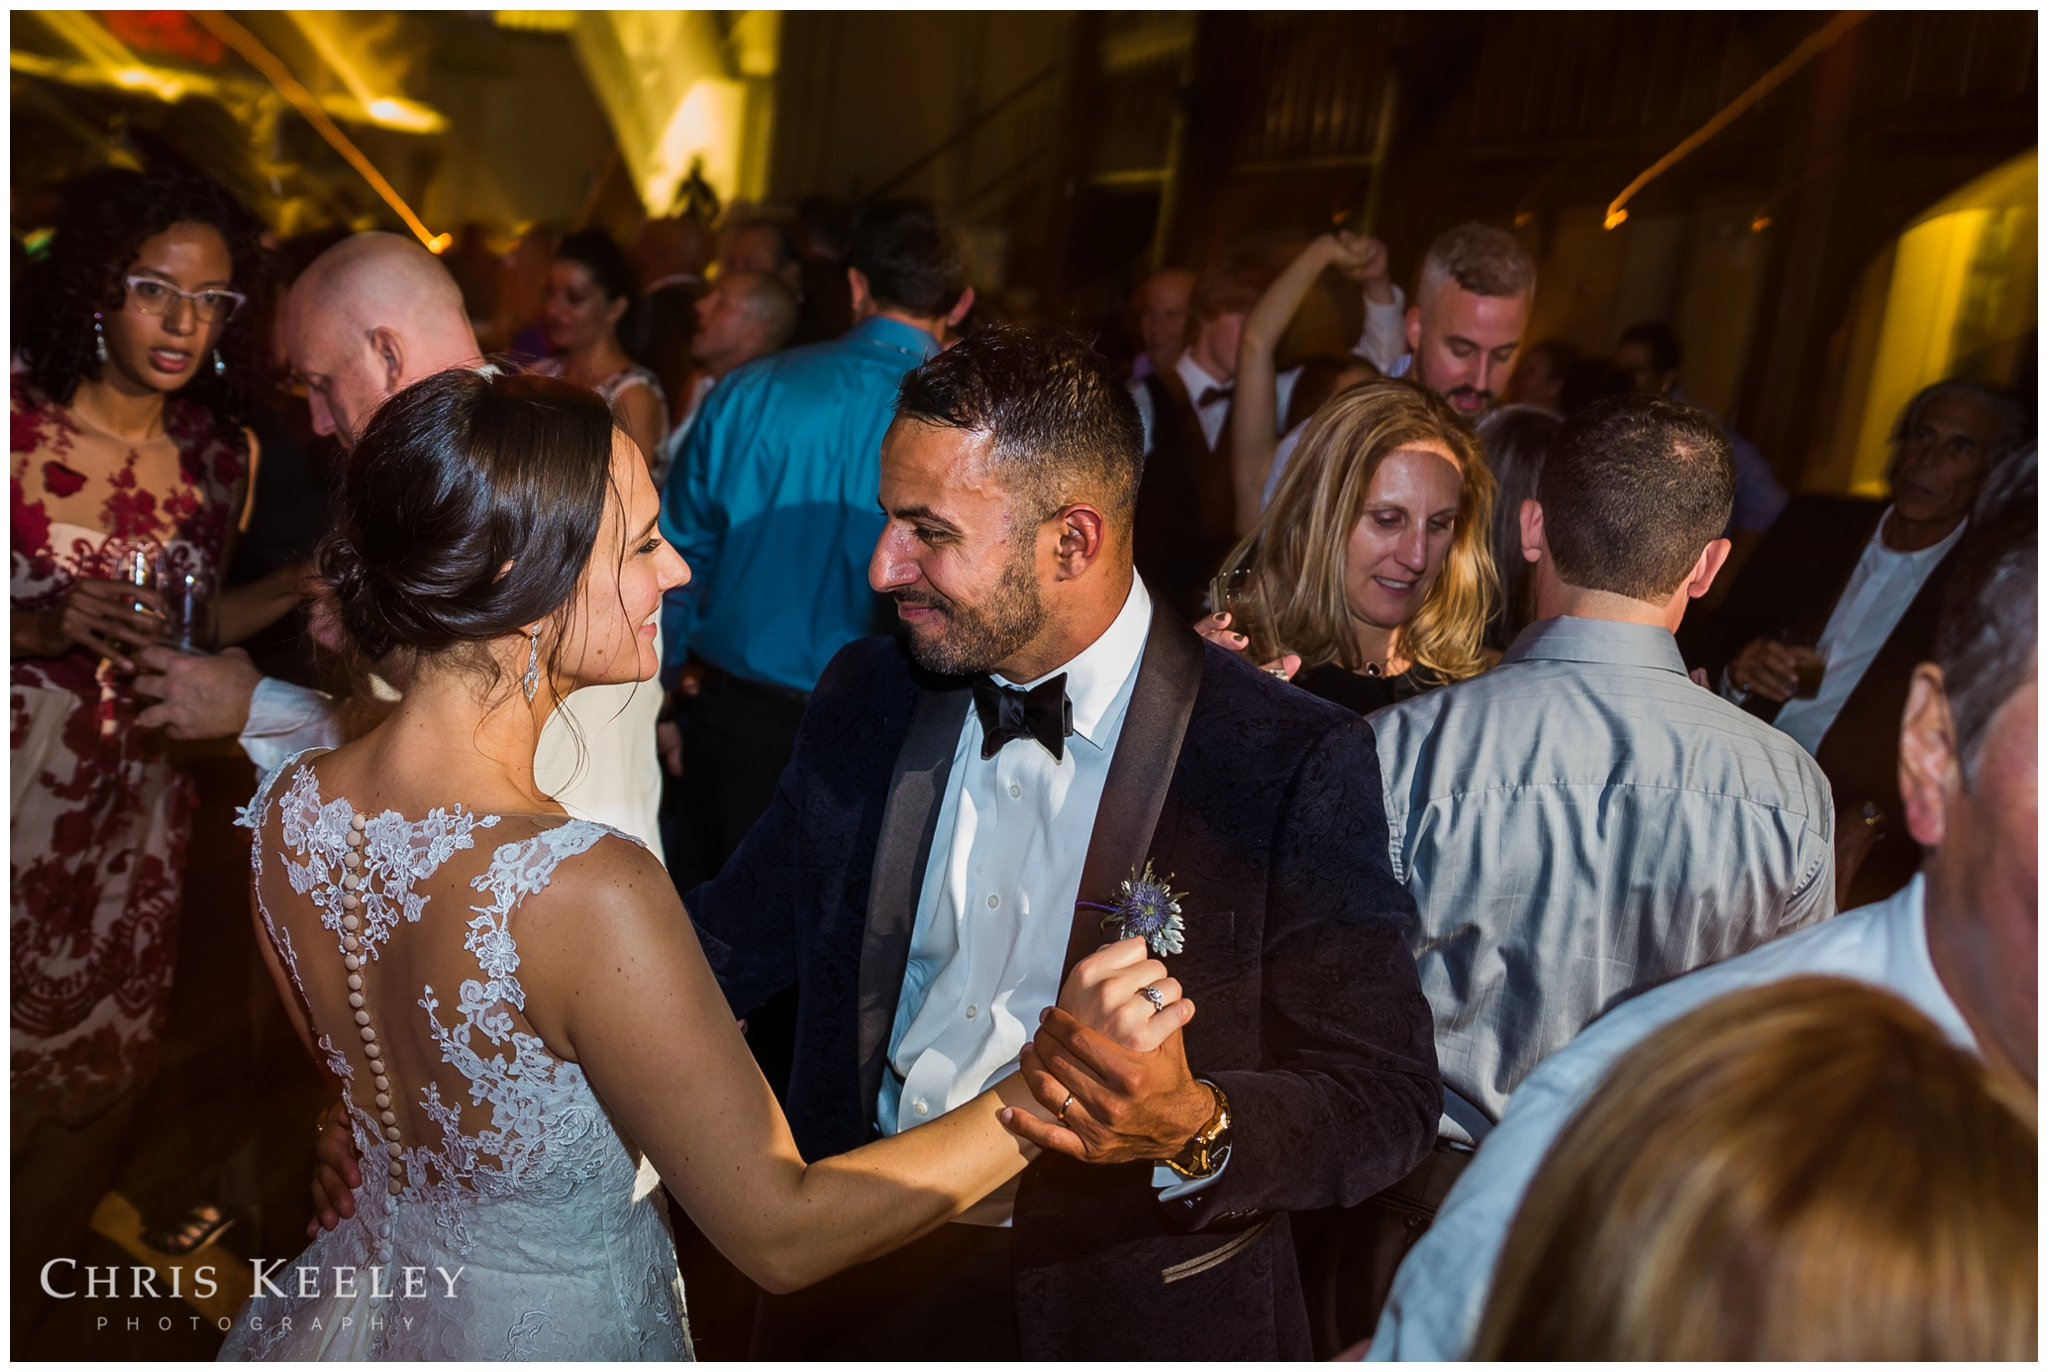 grace-restaurant-portland-maine-wedding-photographer-chris-keeley-68.jpg